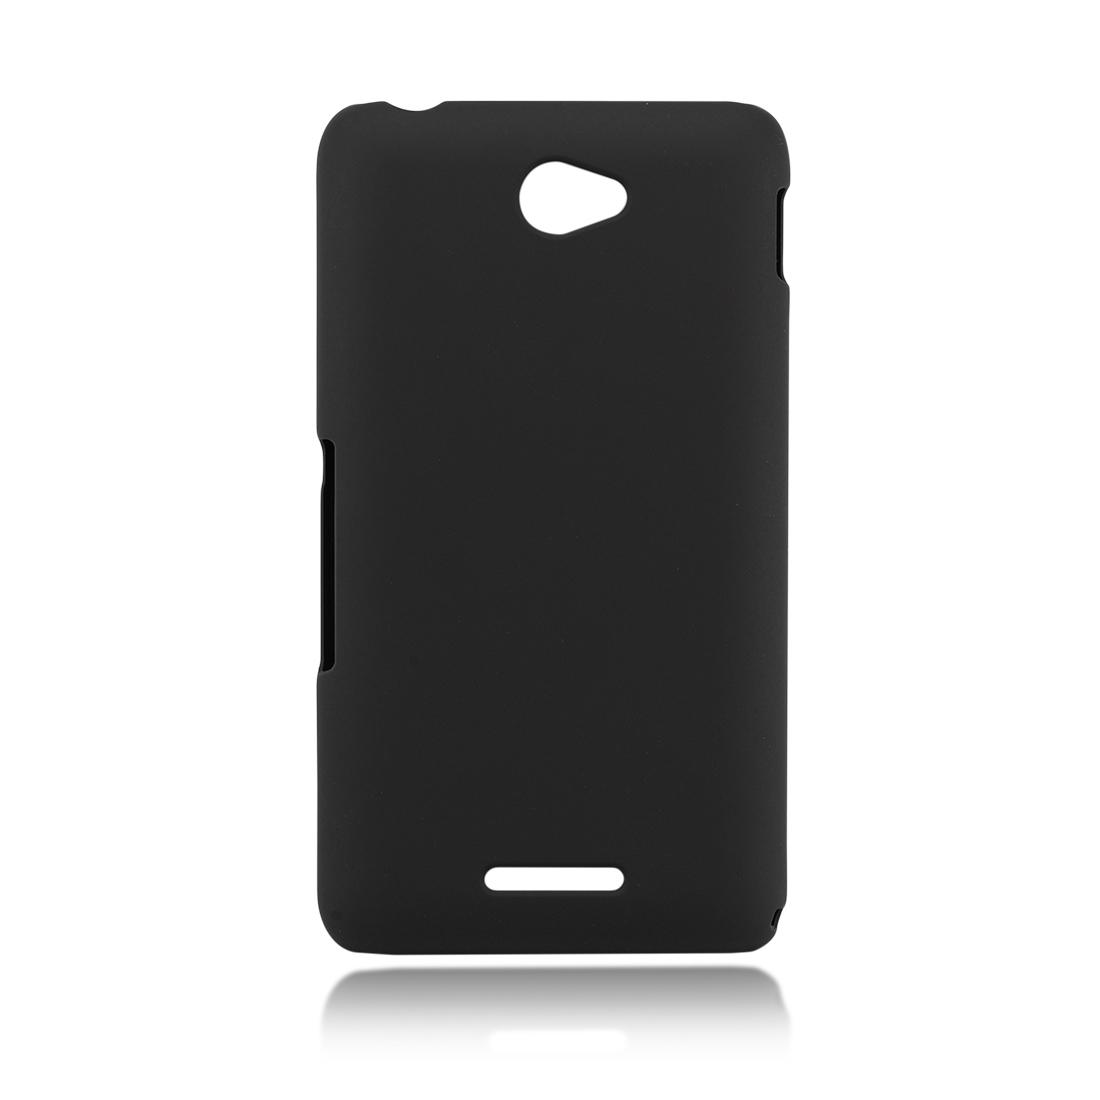 Пластиковая накладка для Xperia E4 чёрного цвета в Sony Centre Воронеж